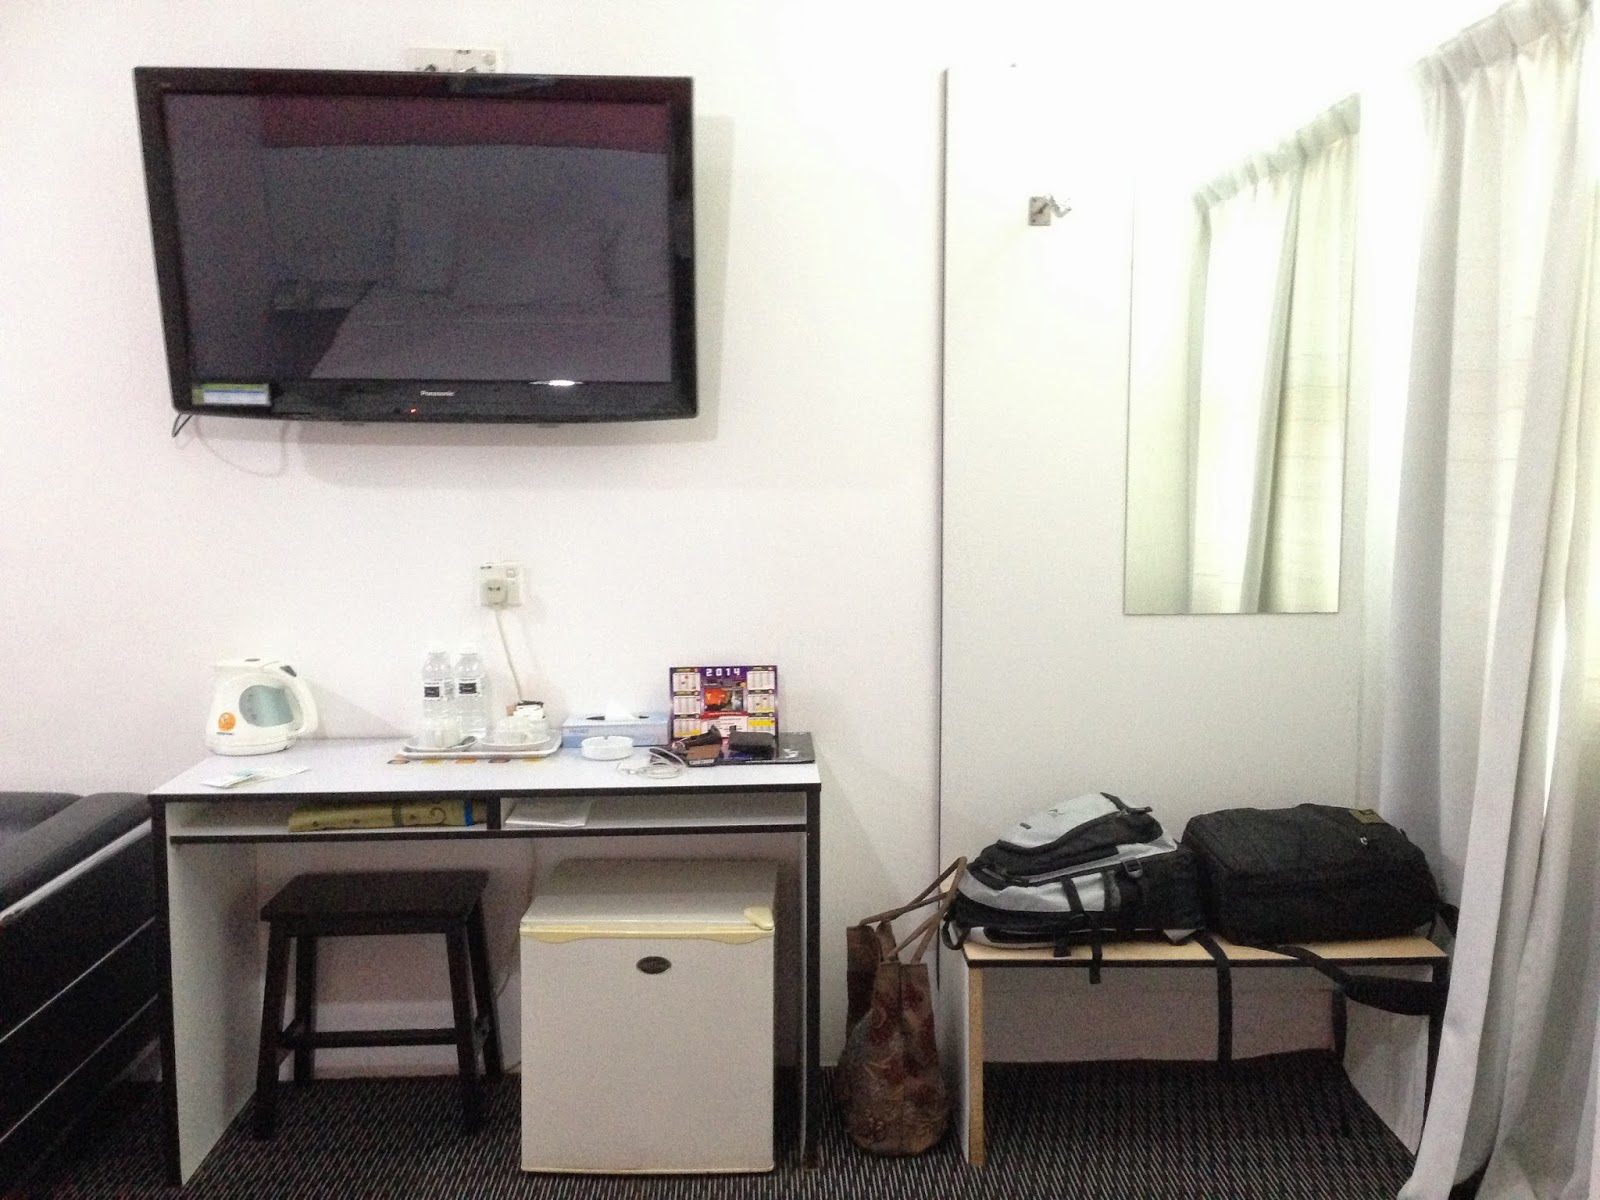 Ridel Hotel's executive room decor